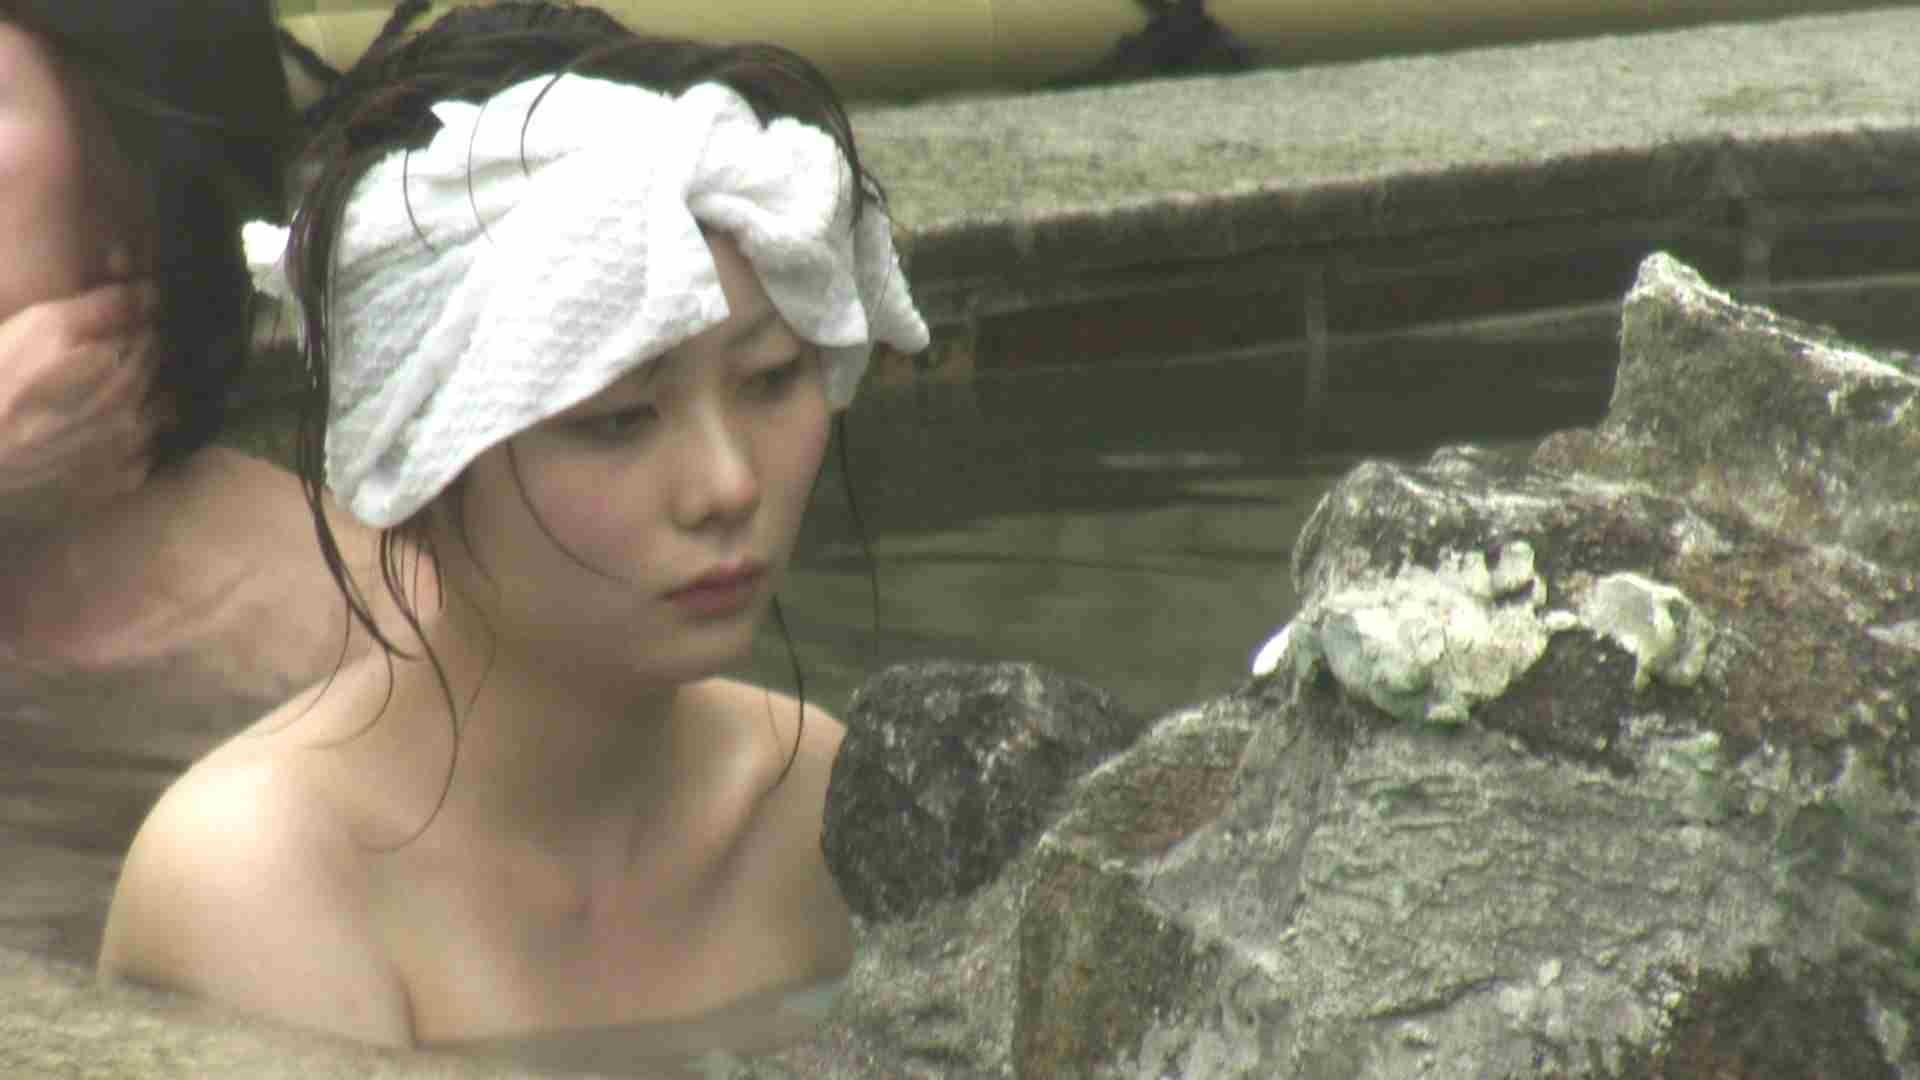 Aquaな露天風呂Vol.147 綺麗なOLたち アダルト動画キャプチャ 102枚 23